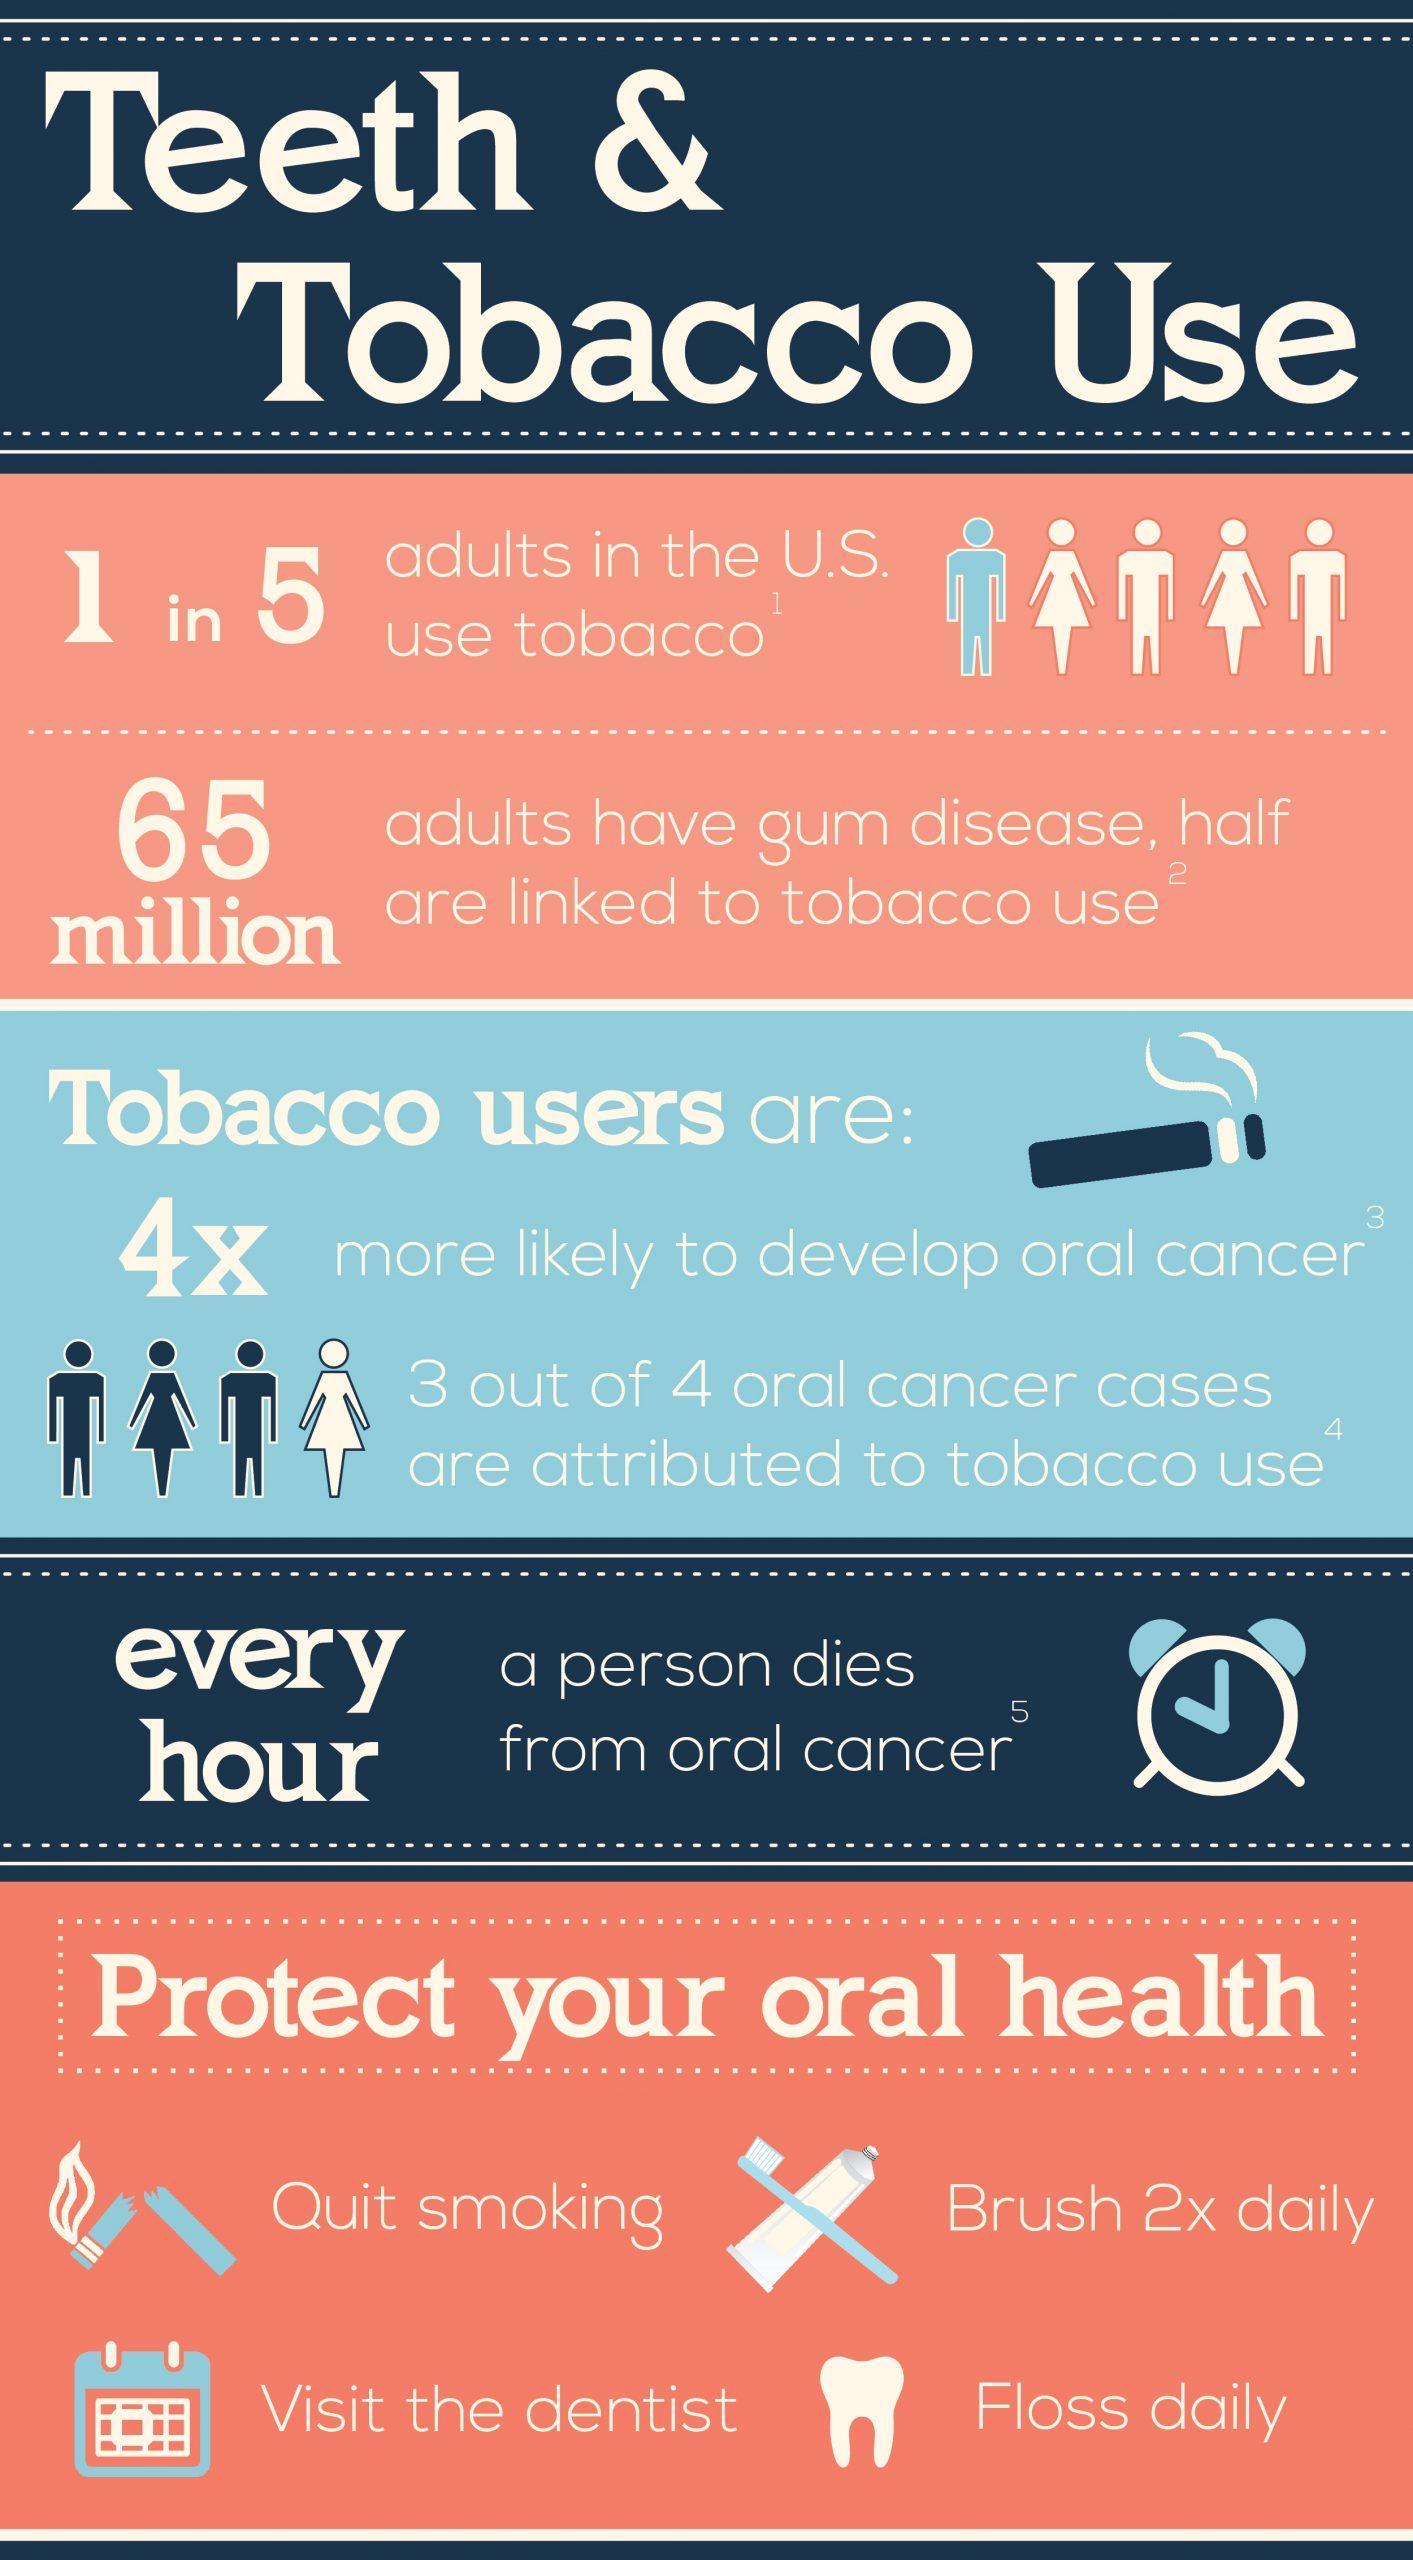 Teeth and Tobacco Use